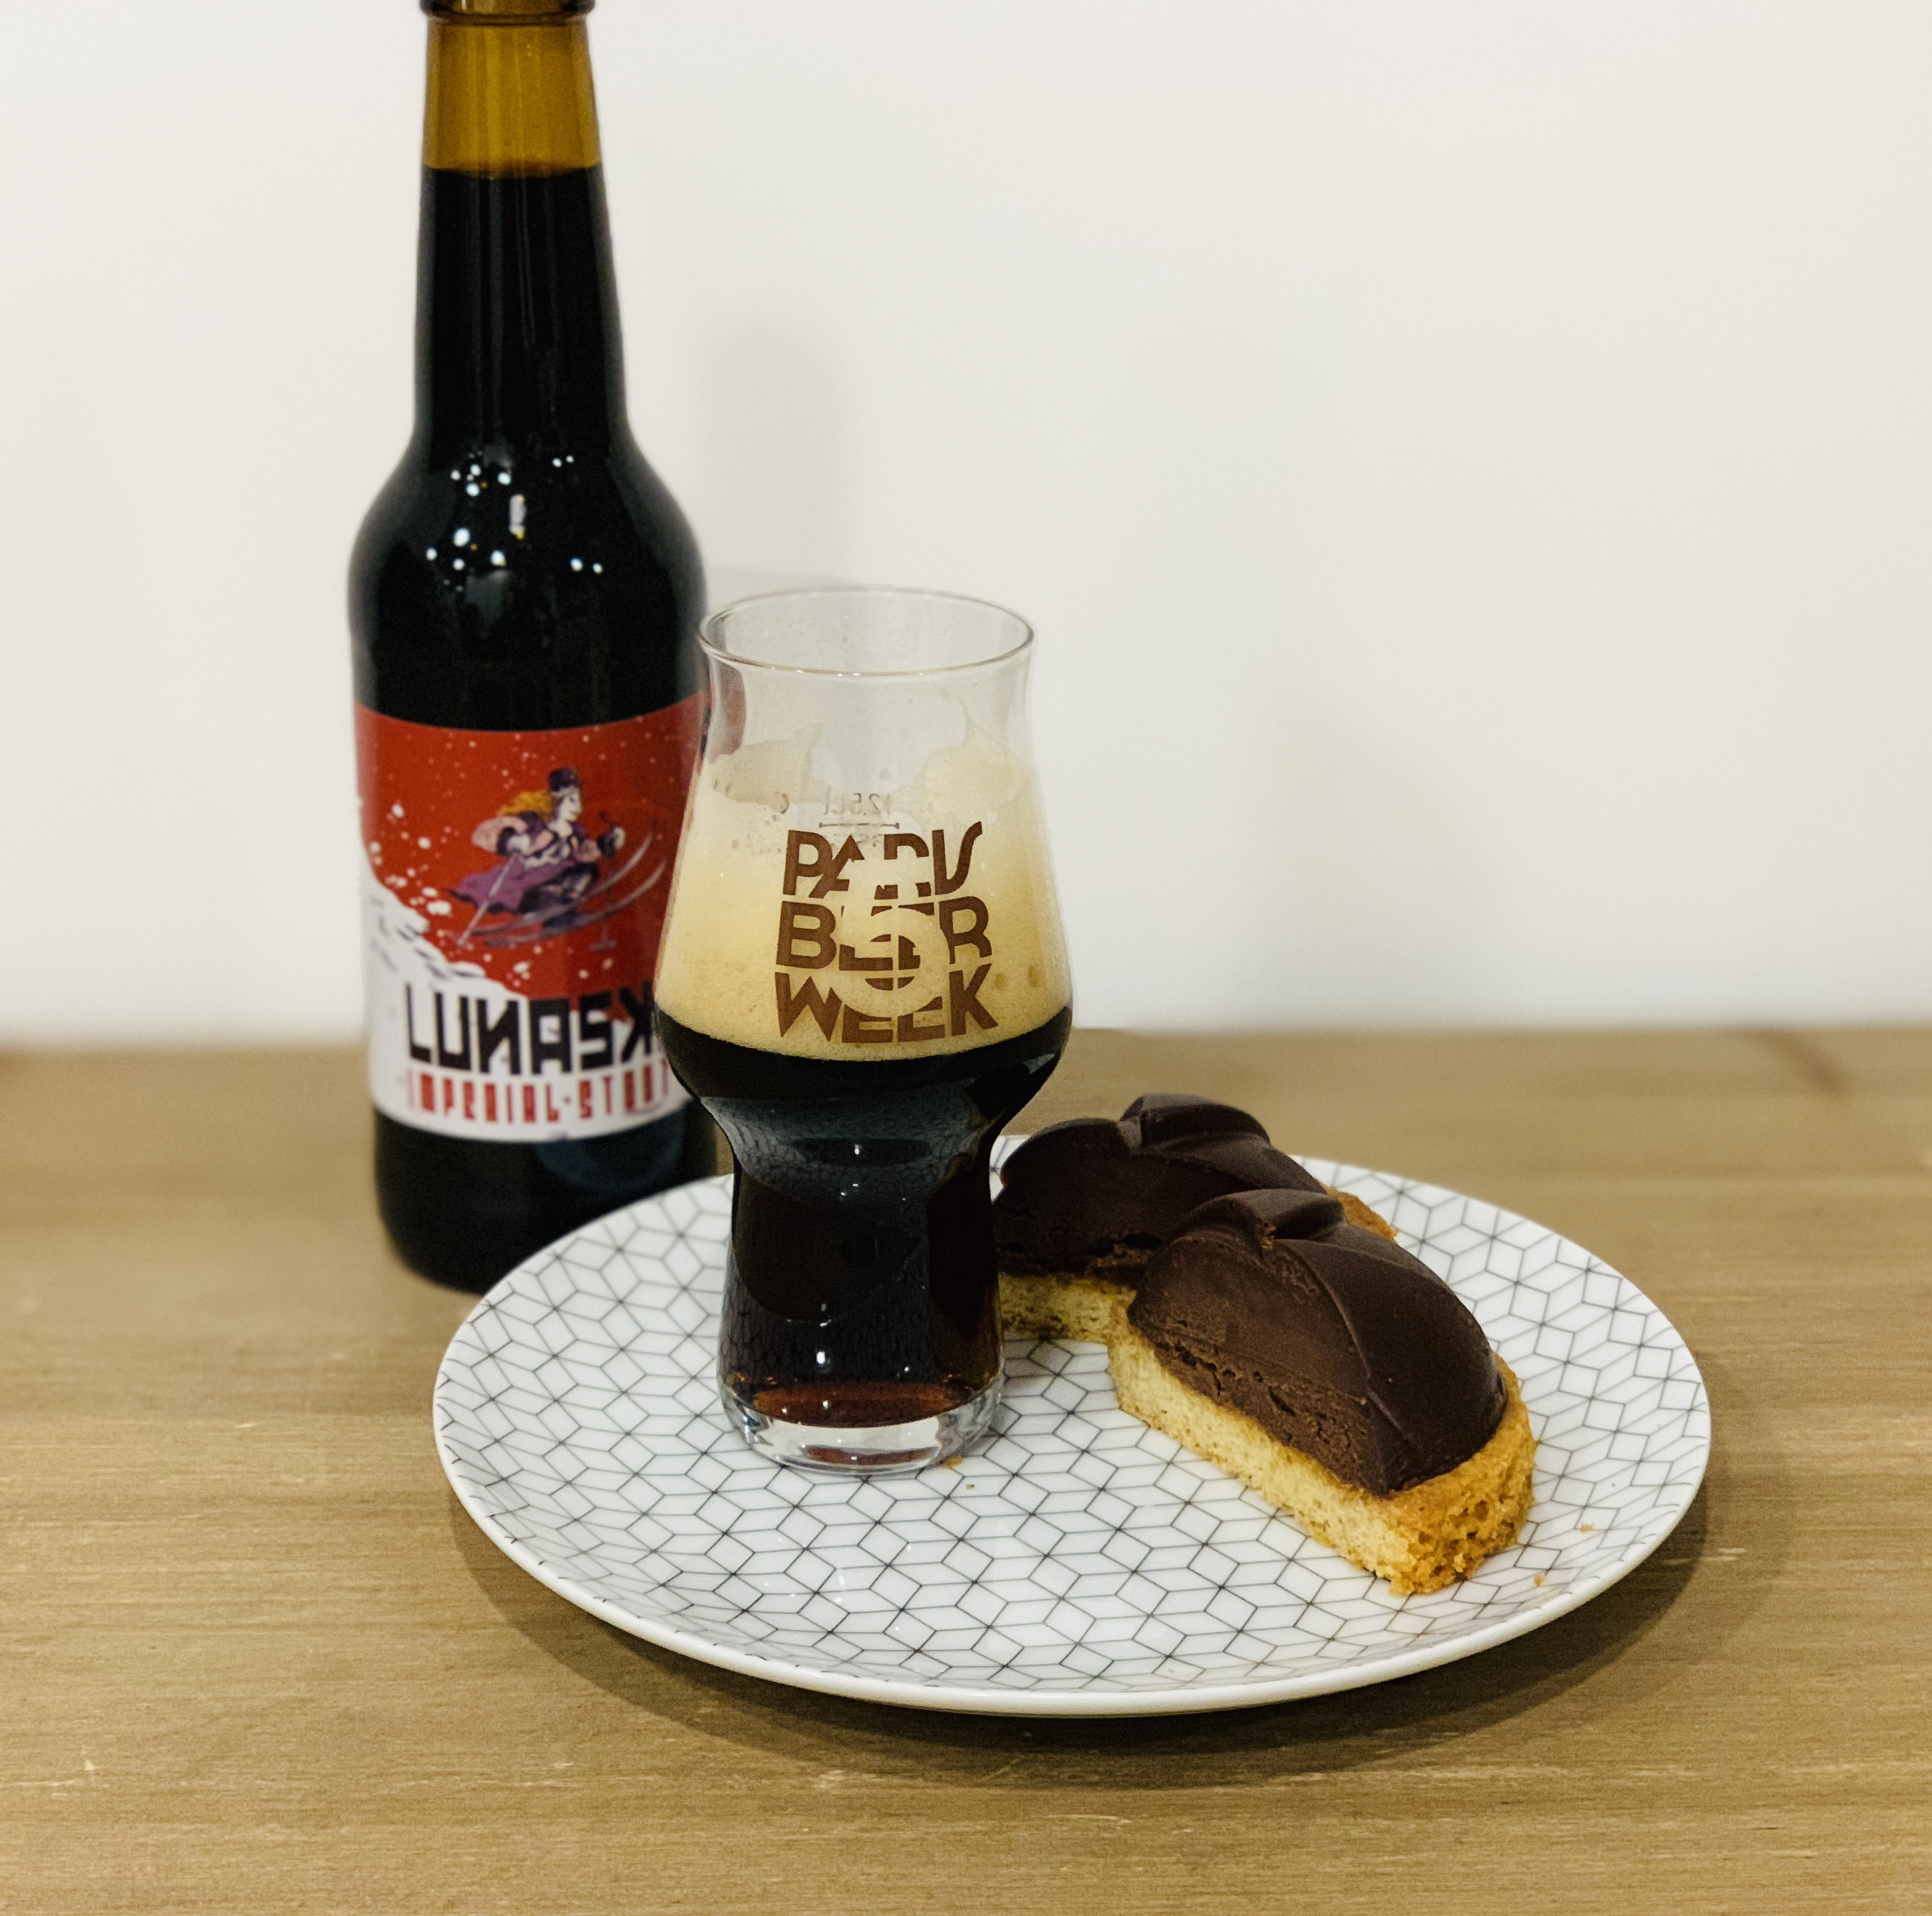 Accord tarte chocolat & bière impérial stout